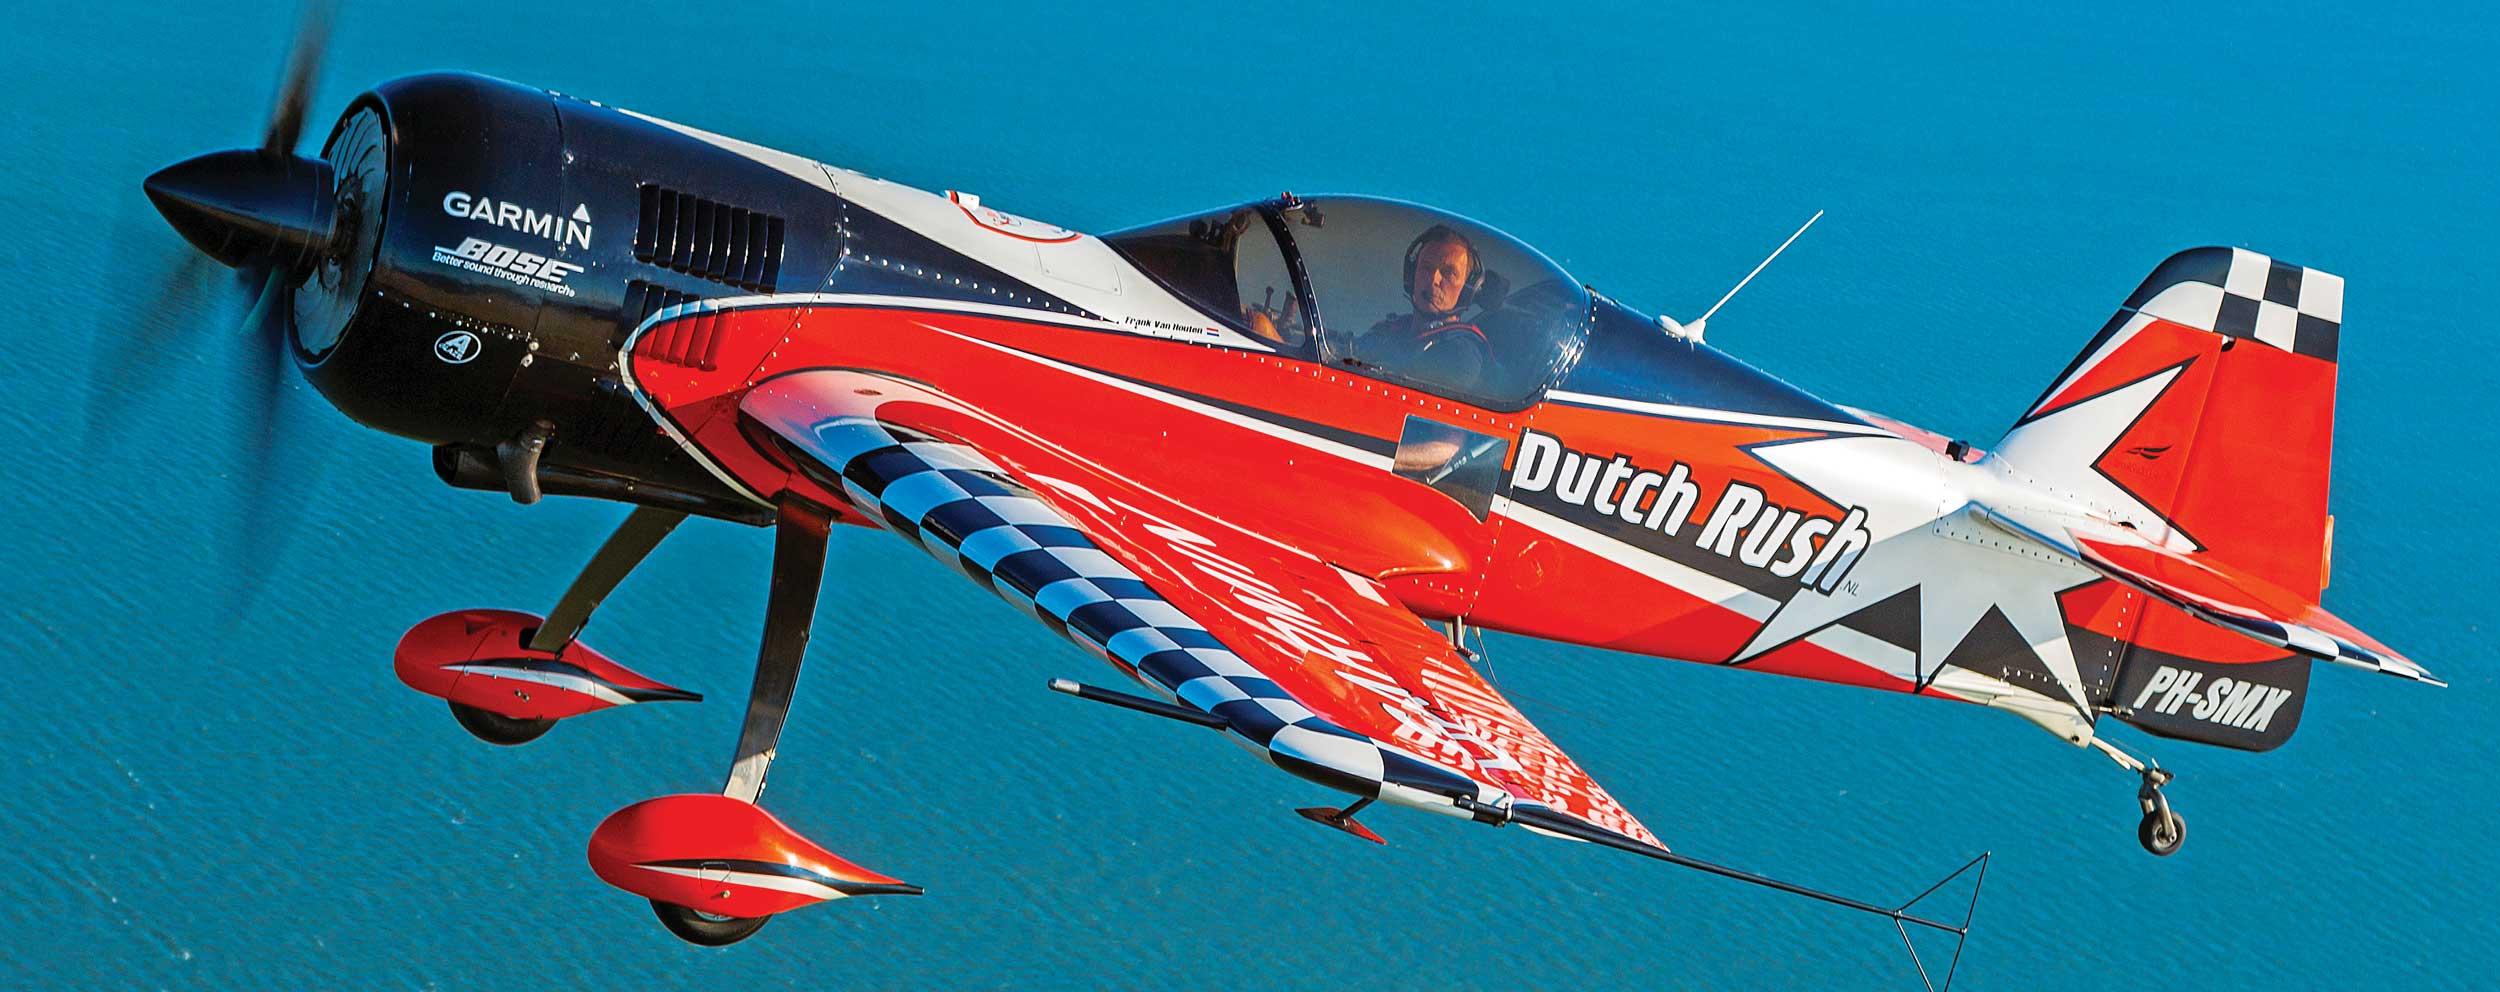 Sukhoi 26 Frank van Houten